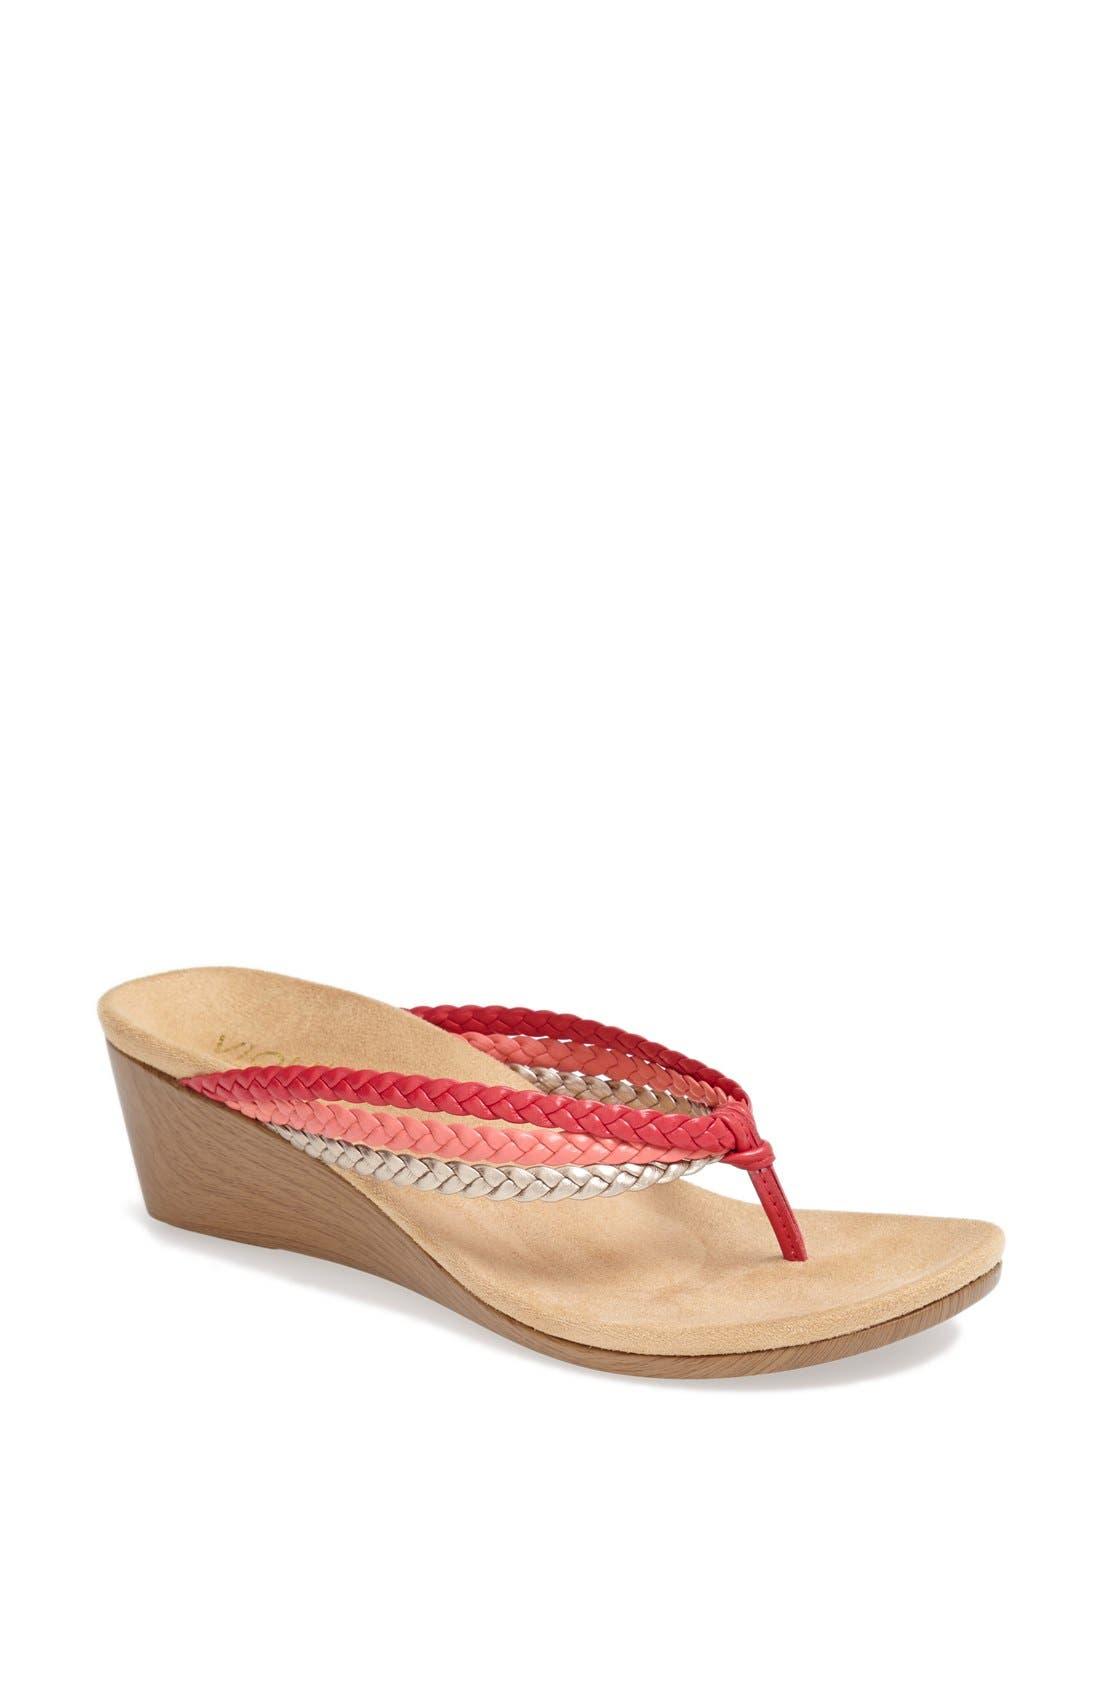 Alternate Image 1 Selected - Vionic 'Ramba' Wedge Sandal